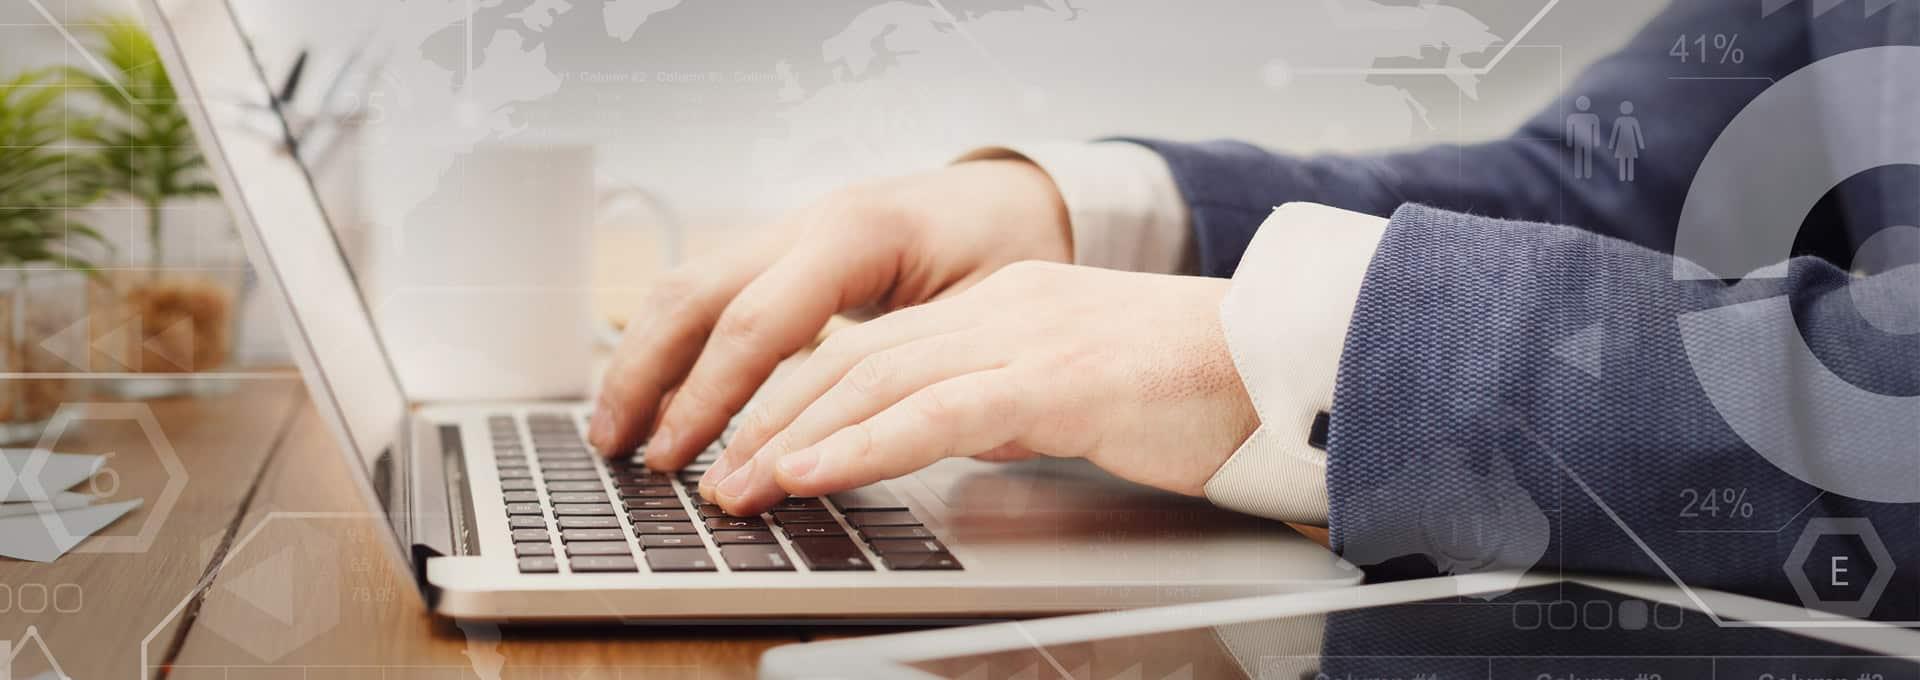 online marketing agenturen